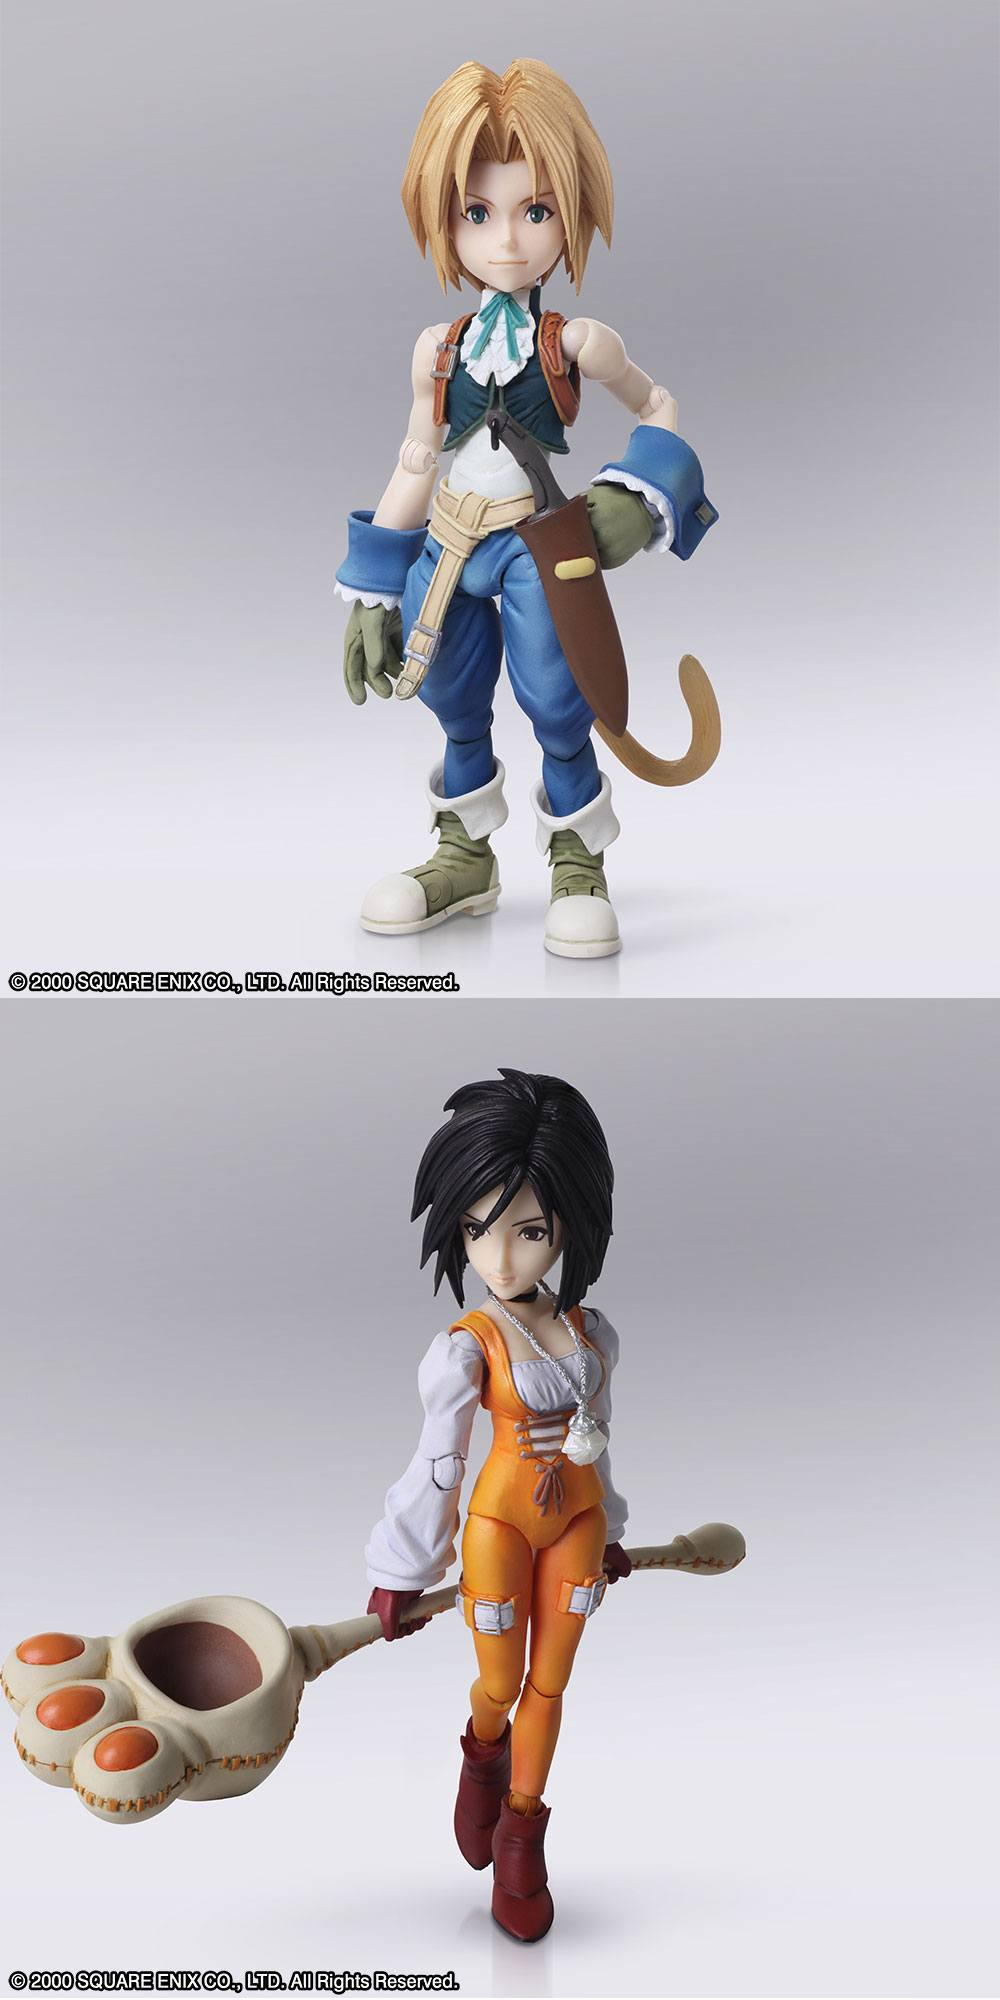 Final Fantasy IX Bring Arts Action Figures Zidane Tribal & Garnet Til Alexandros XVII 12 - 17 cm